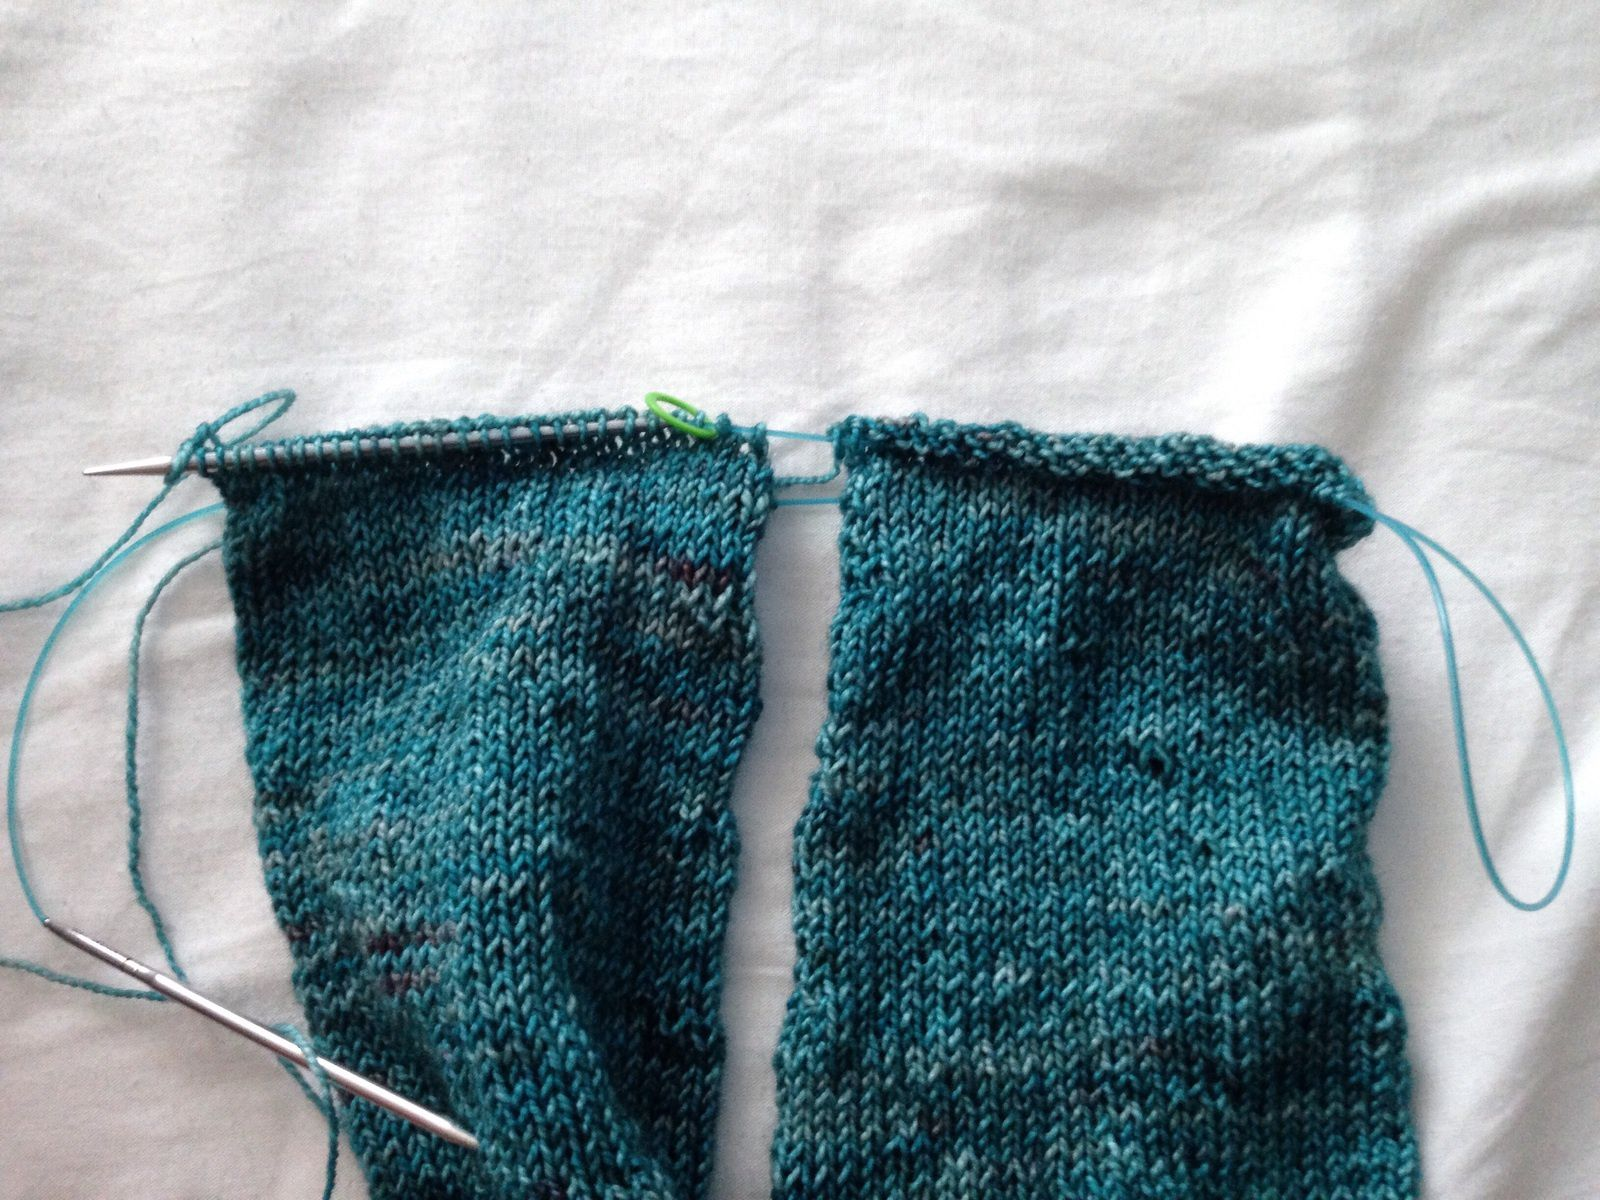 Tuto : tricoter 2 manches ensemble version nomade